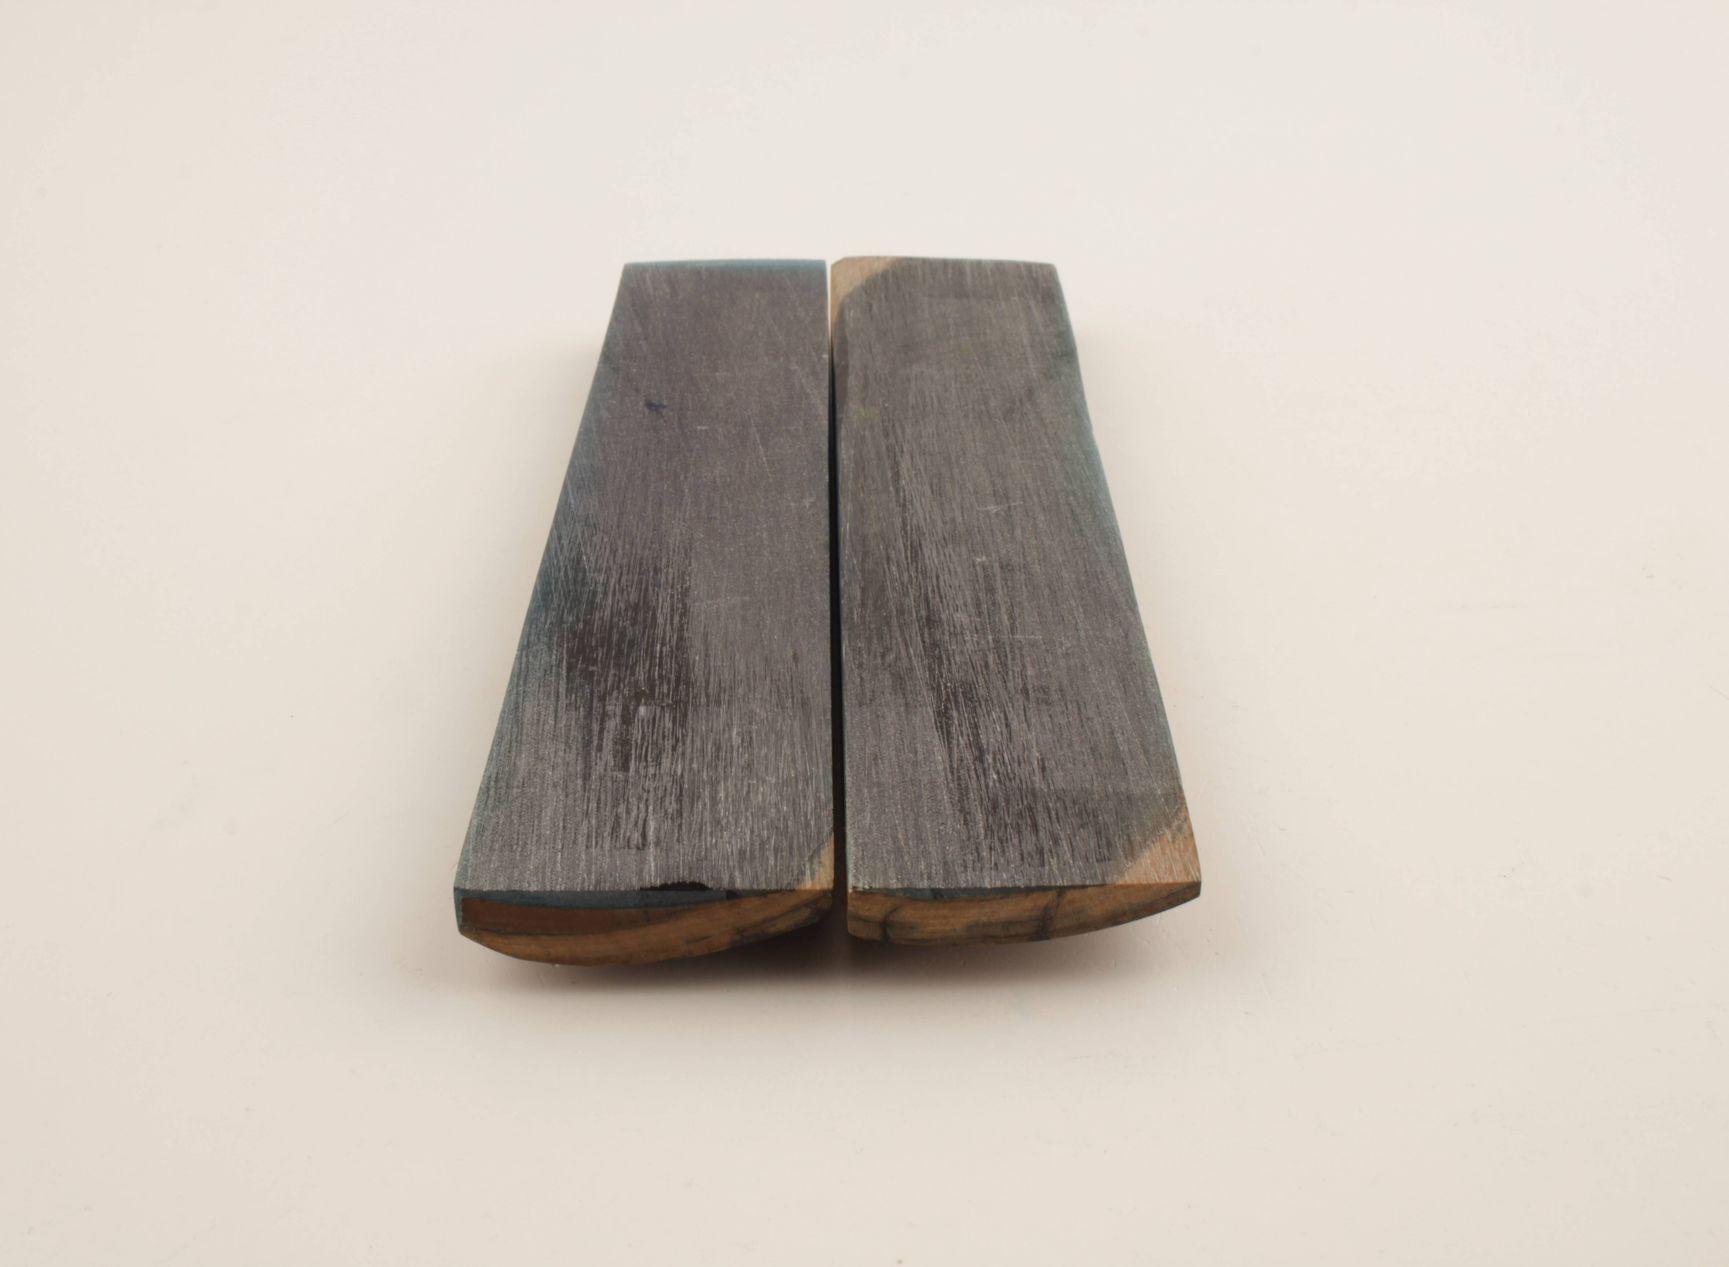 Stabilised mammoth bark scales